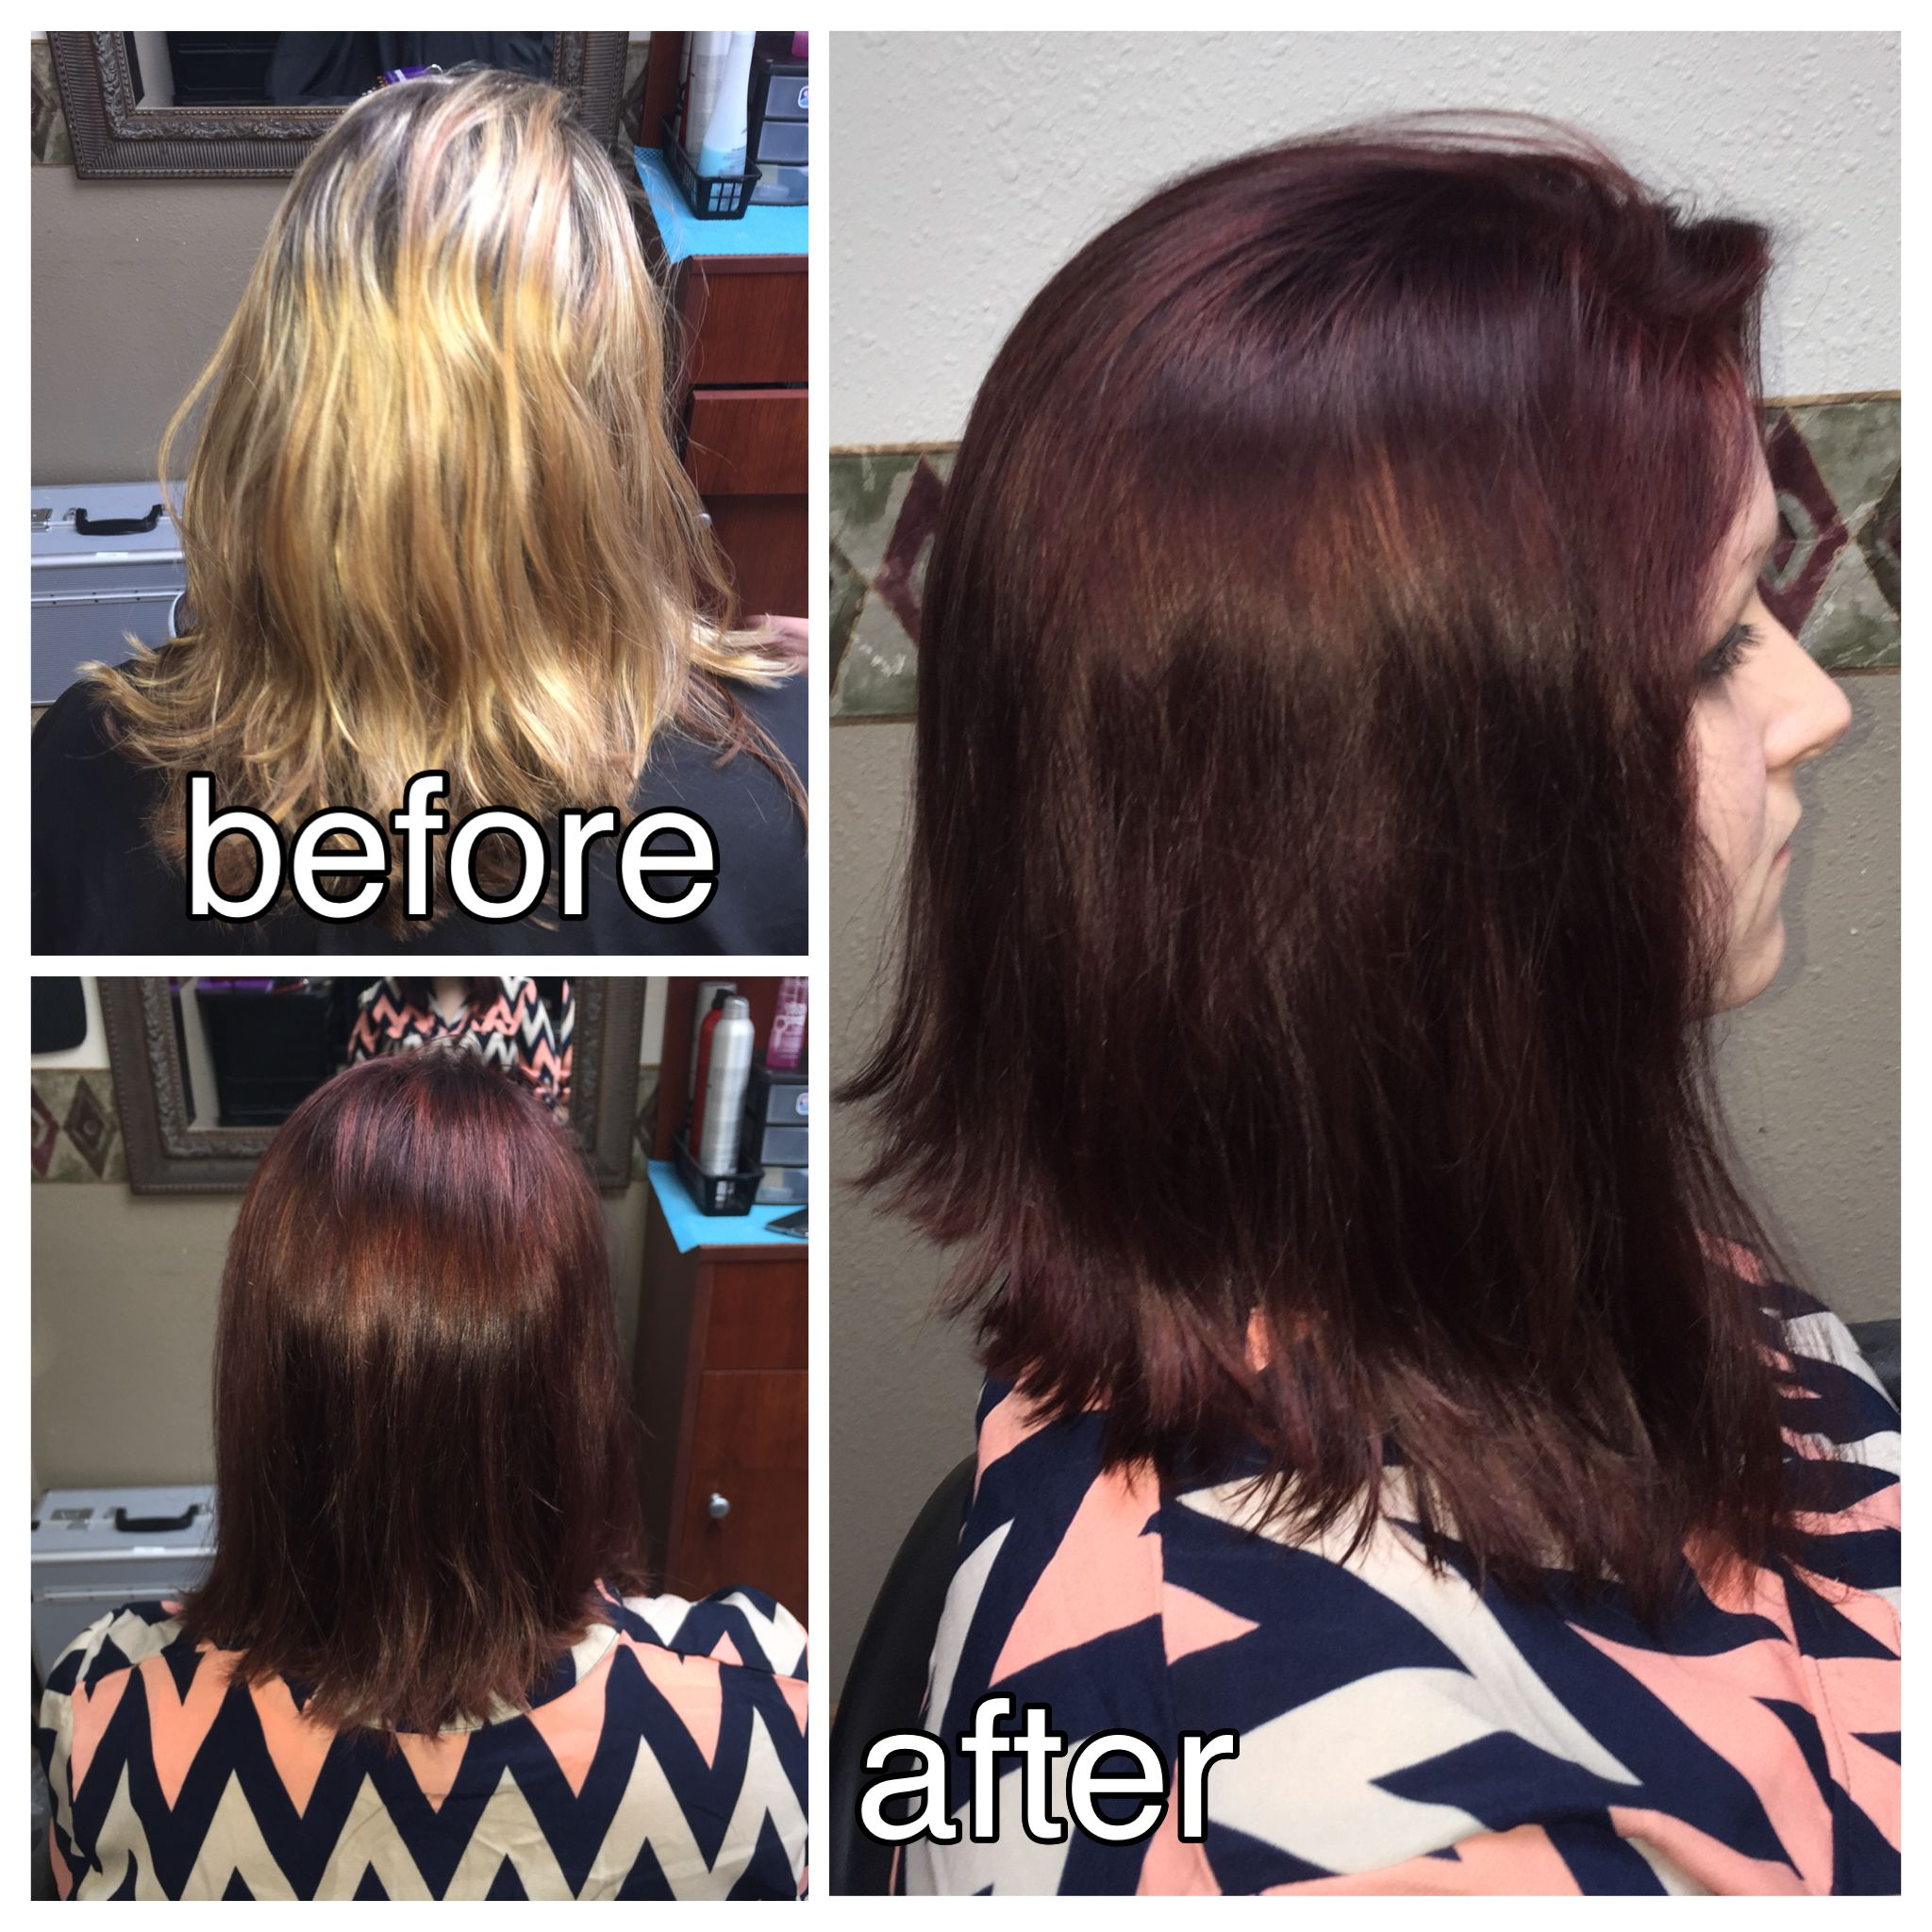 Pravana 537 543 colors pinterest hair inspiration pravana 537 543 nvjuhfo Images